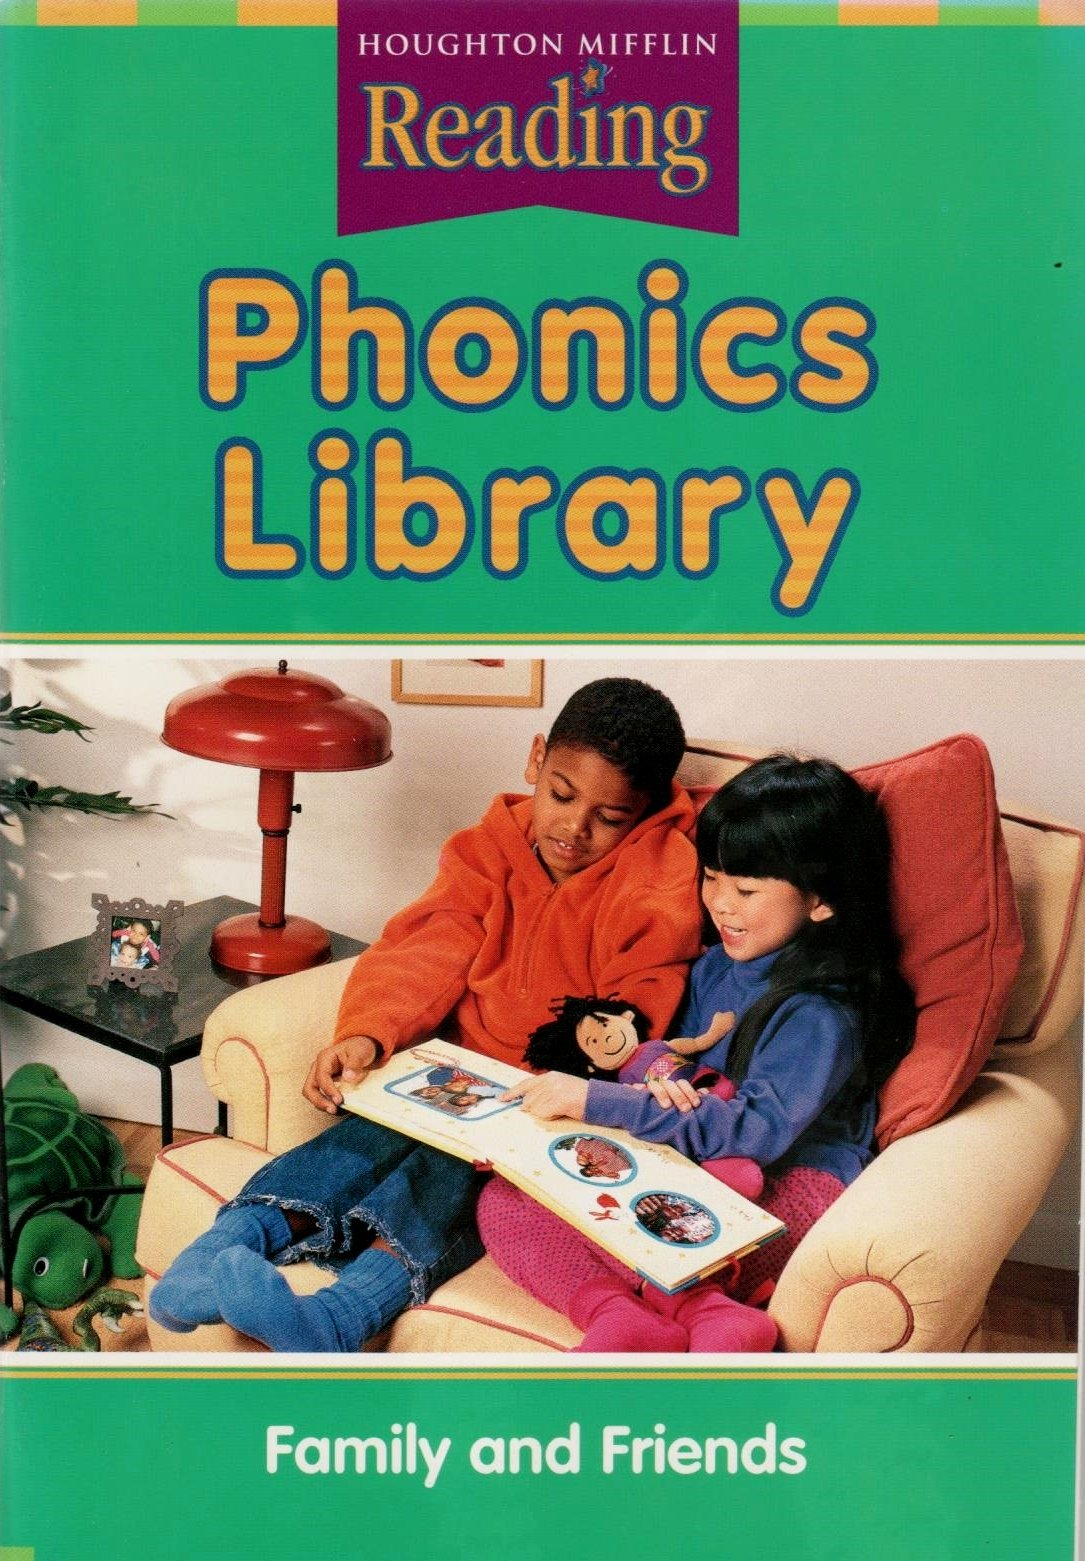 Download Houghton Mifflin Reading: Phonics Library Lv 1 Thm 4 (Houghton Mifflin Reading: A Legacy of Literacy) PDF